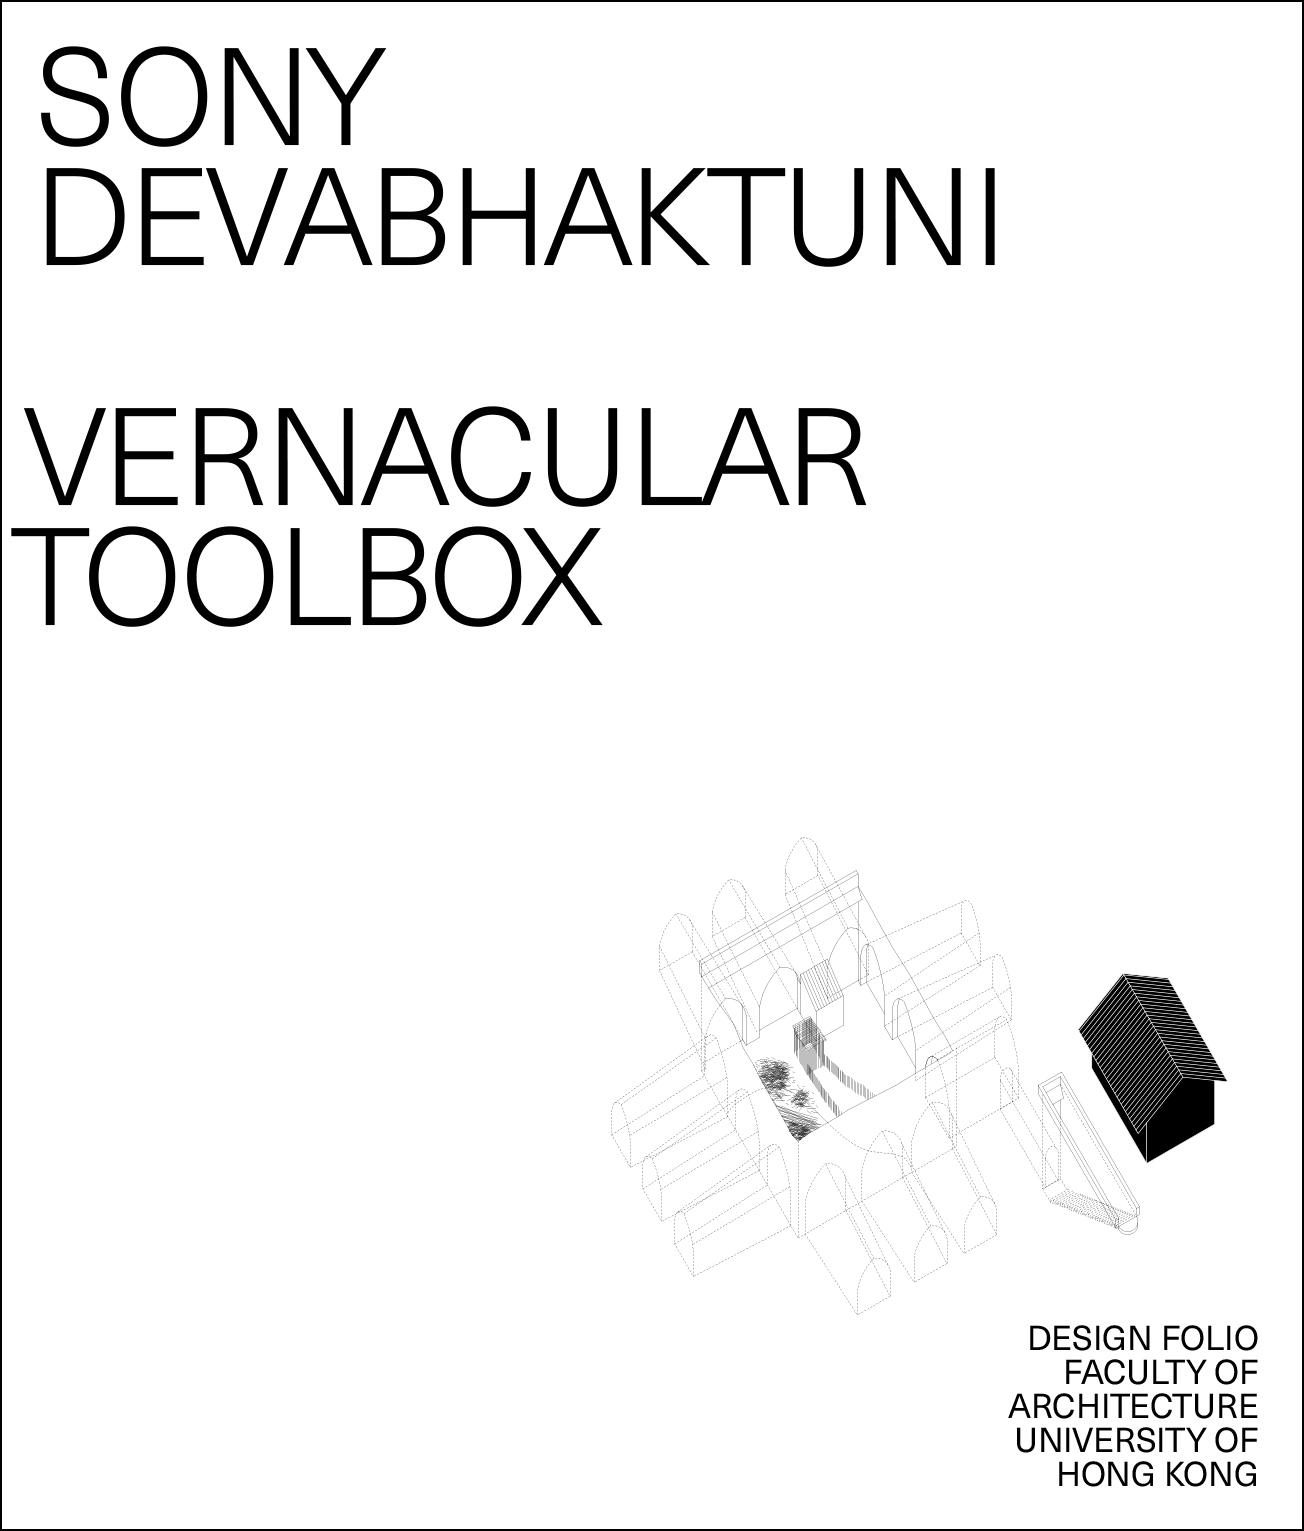 Vernacular Toolbox